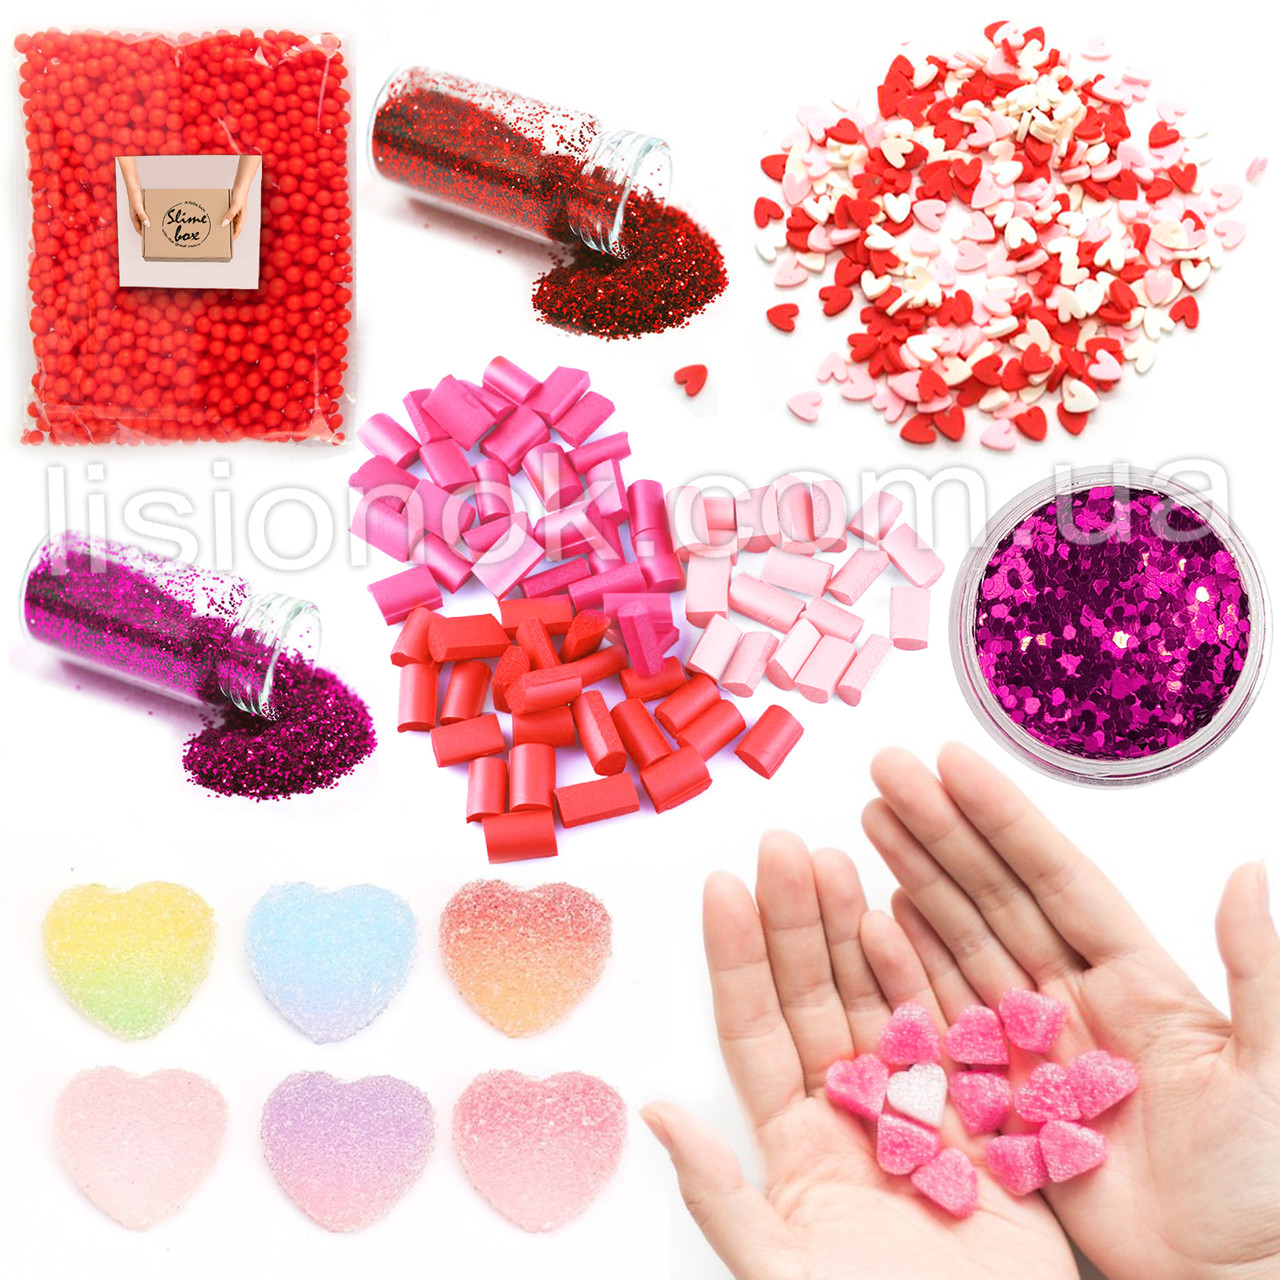 Love Slime Box: шармики, блестки, фоам чанкс, пенопласт, посыпки сердечки